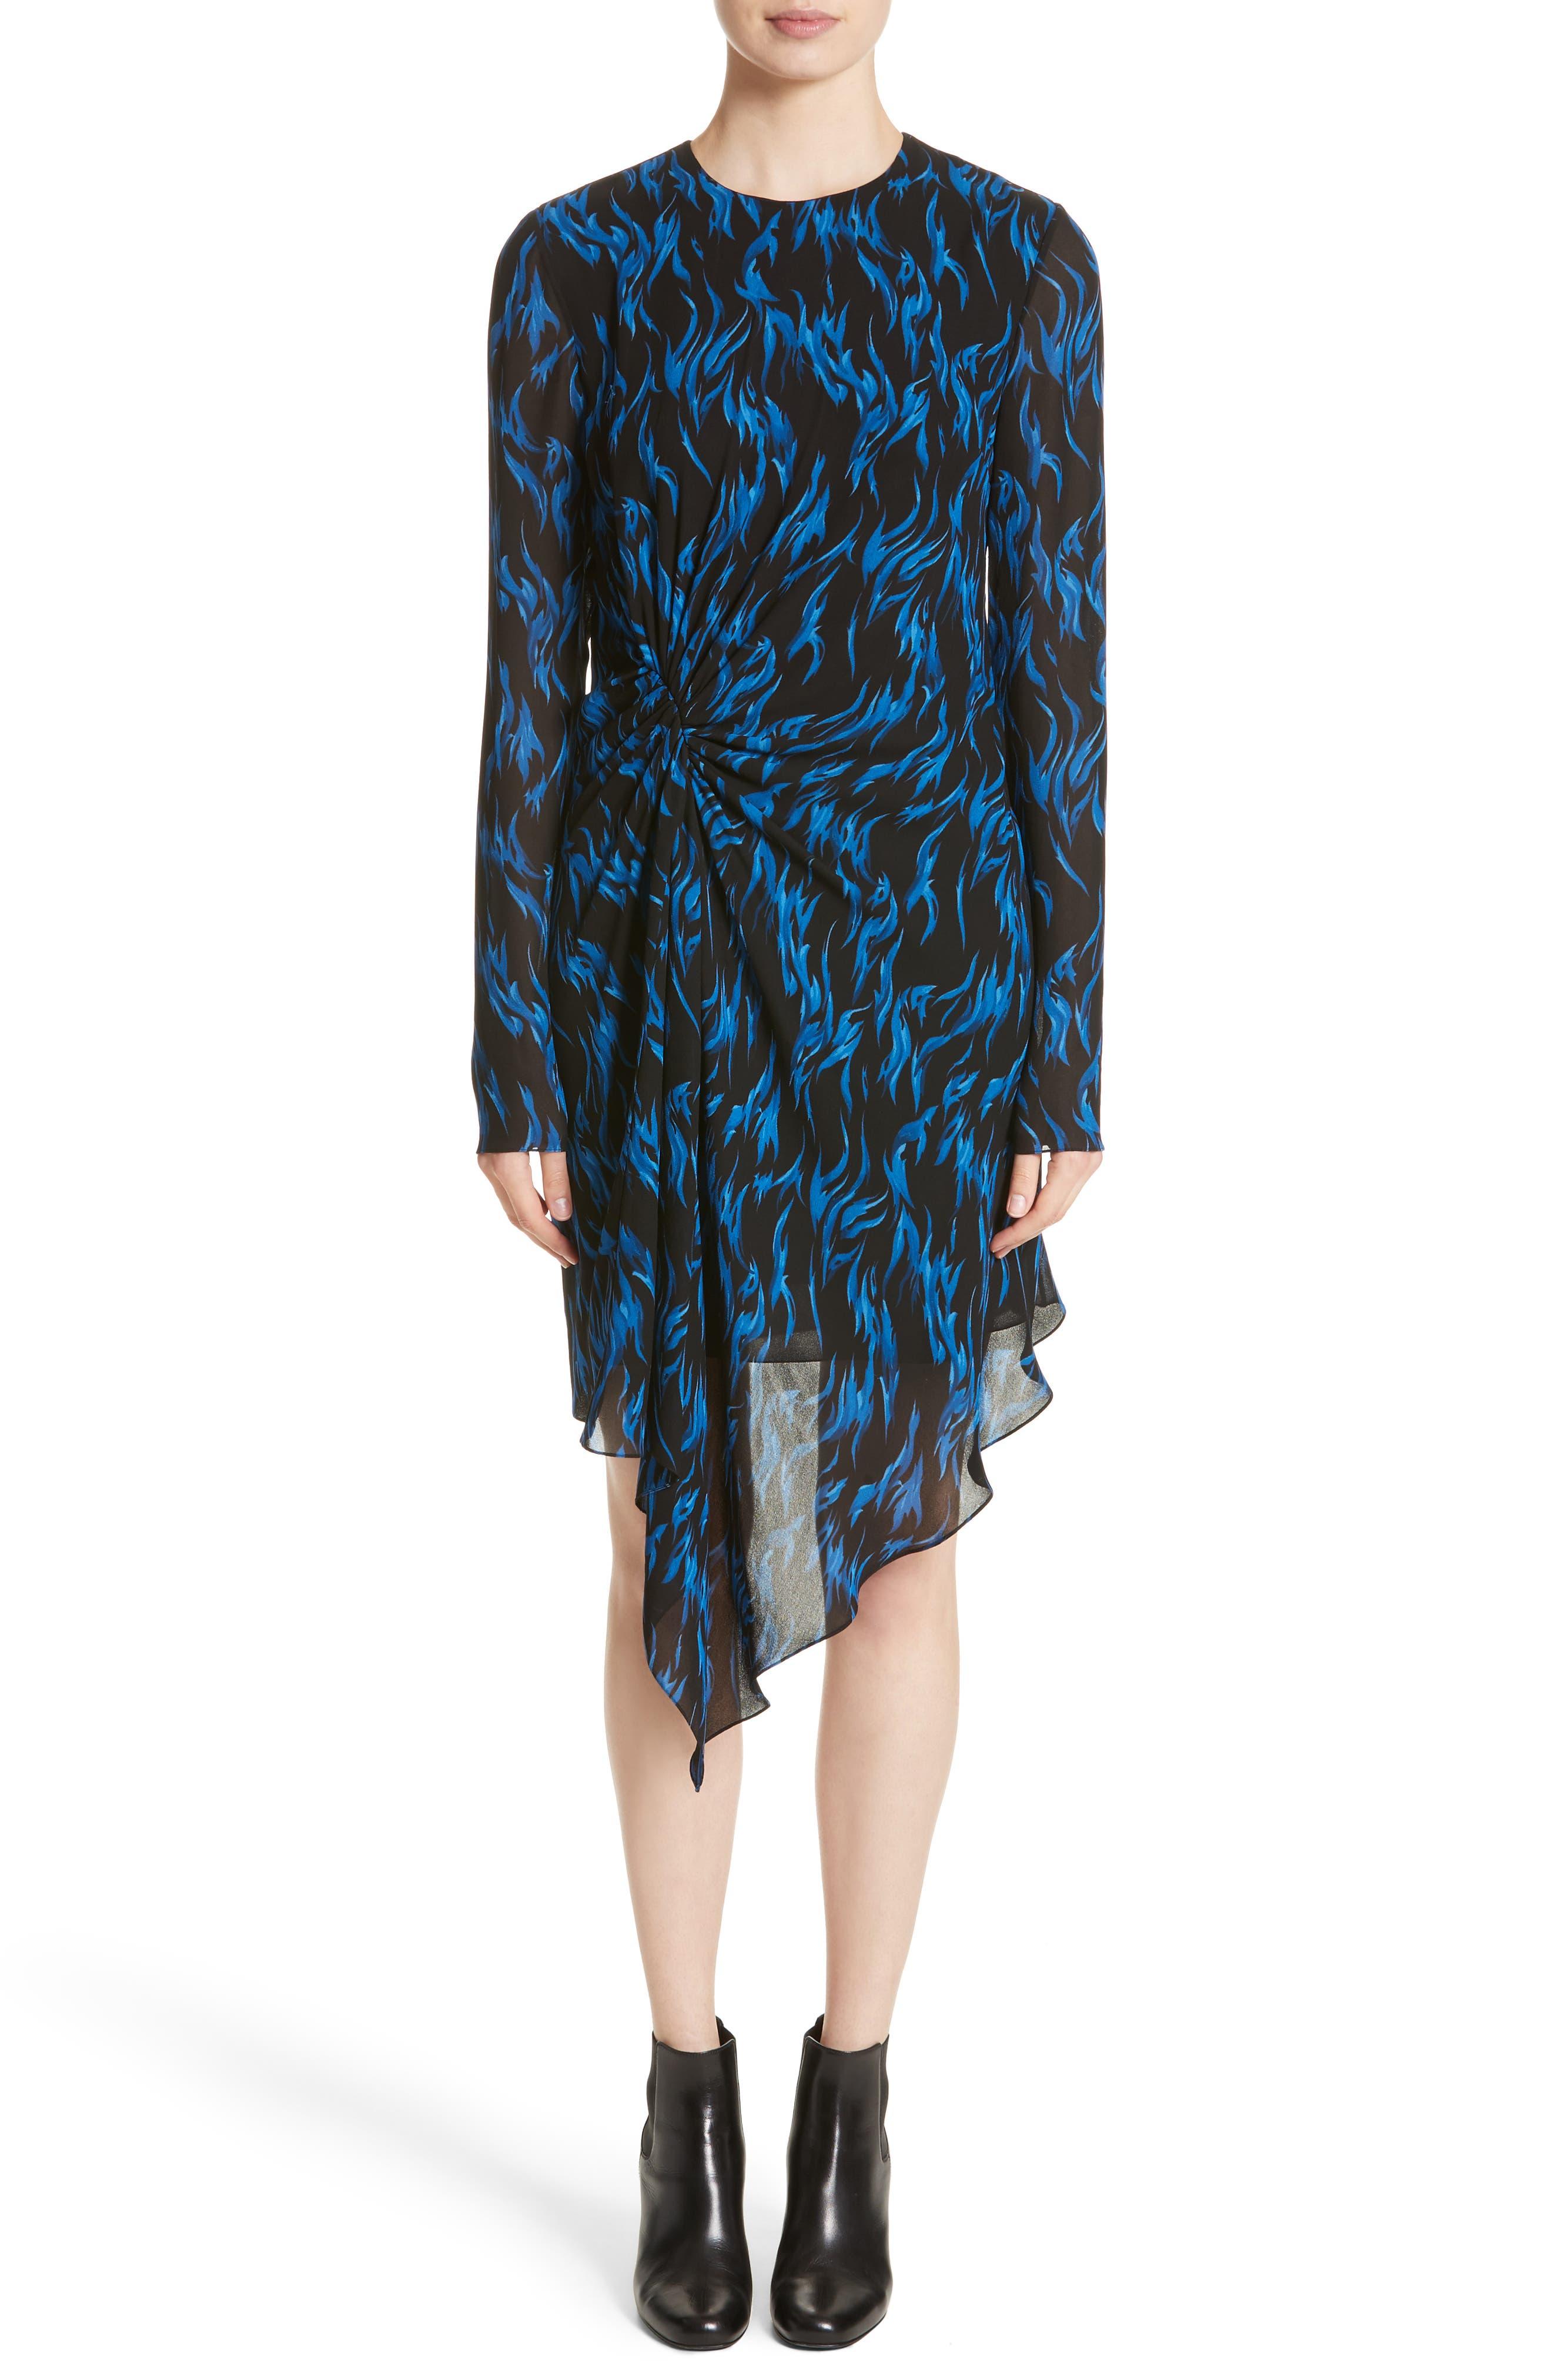 Alternate Image 1 Selected - Saint Laurent Flame Print Crepe Asymmetrical Dress